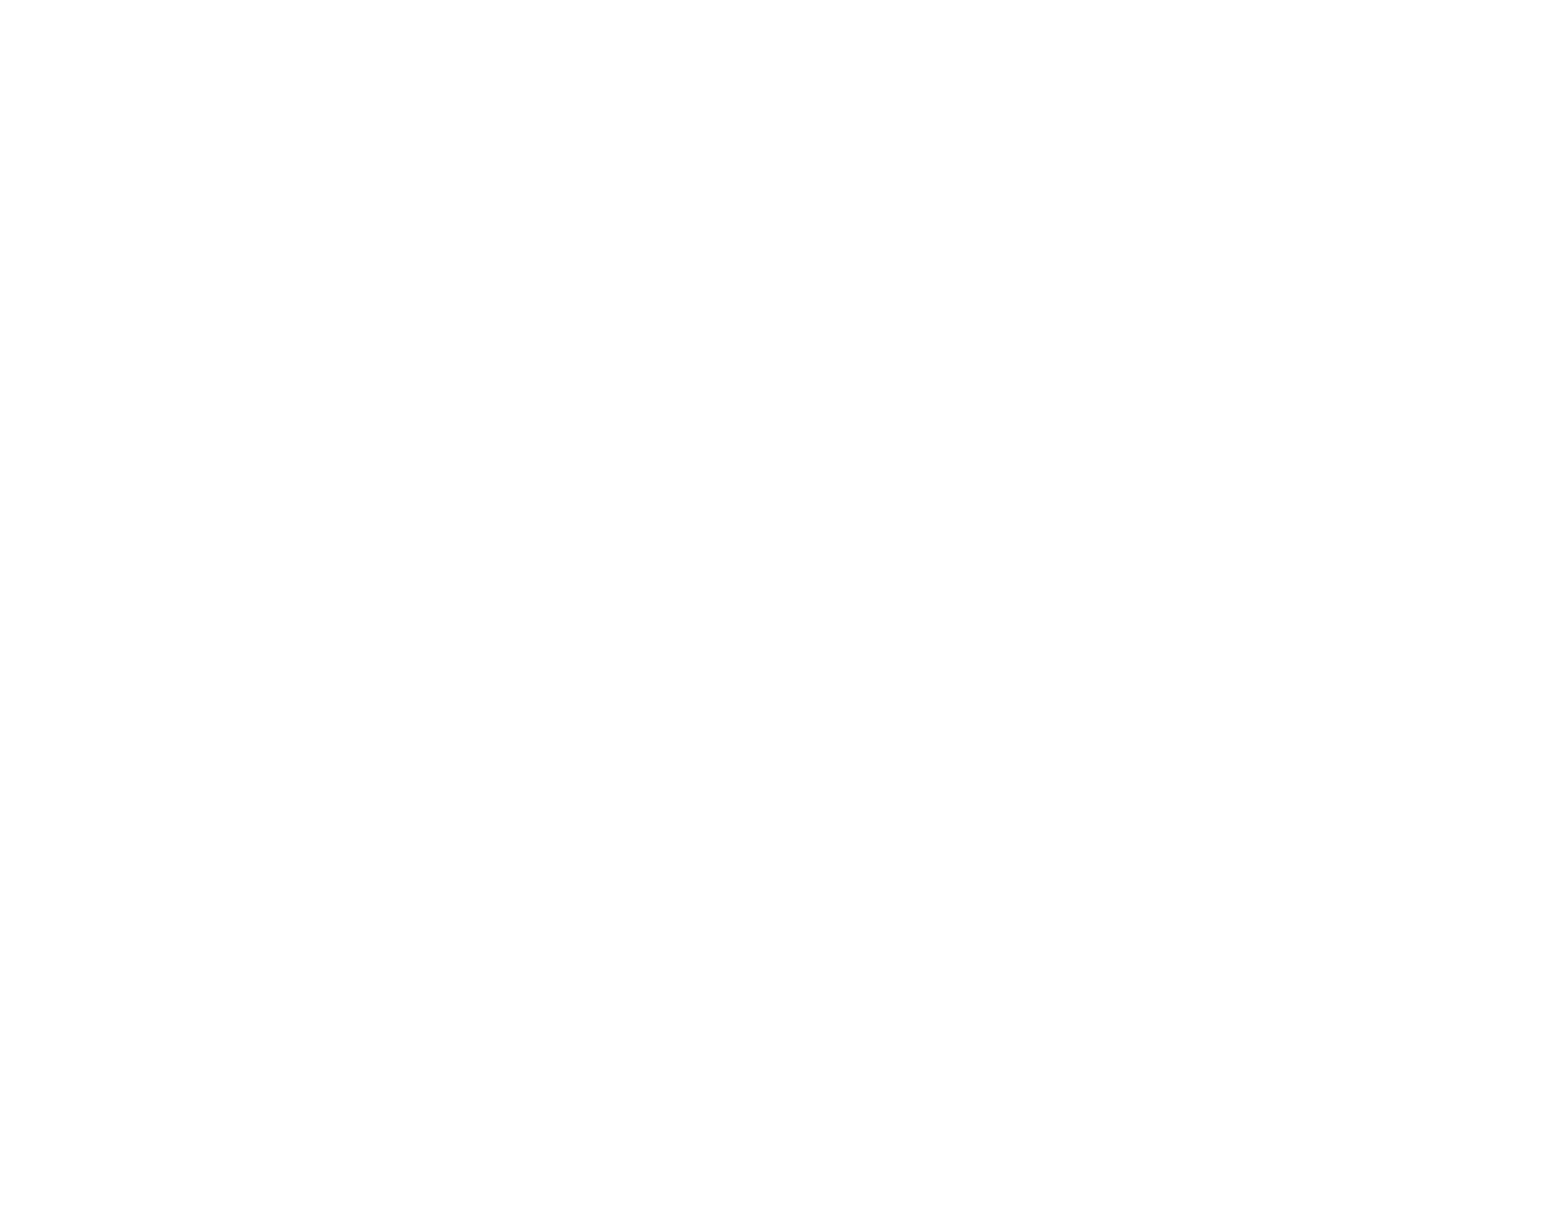 Jozaso correct burmese font (white) Vertical.png